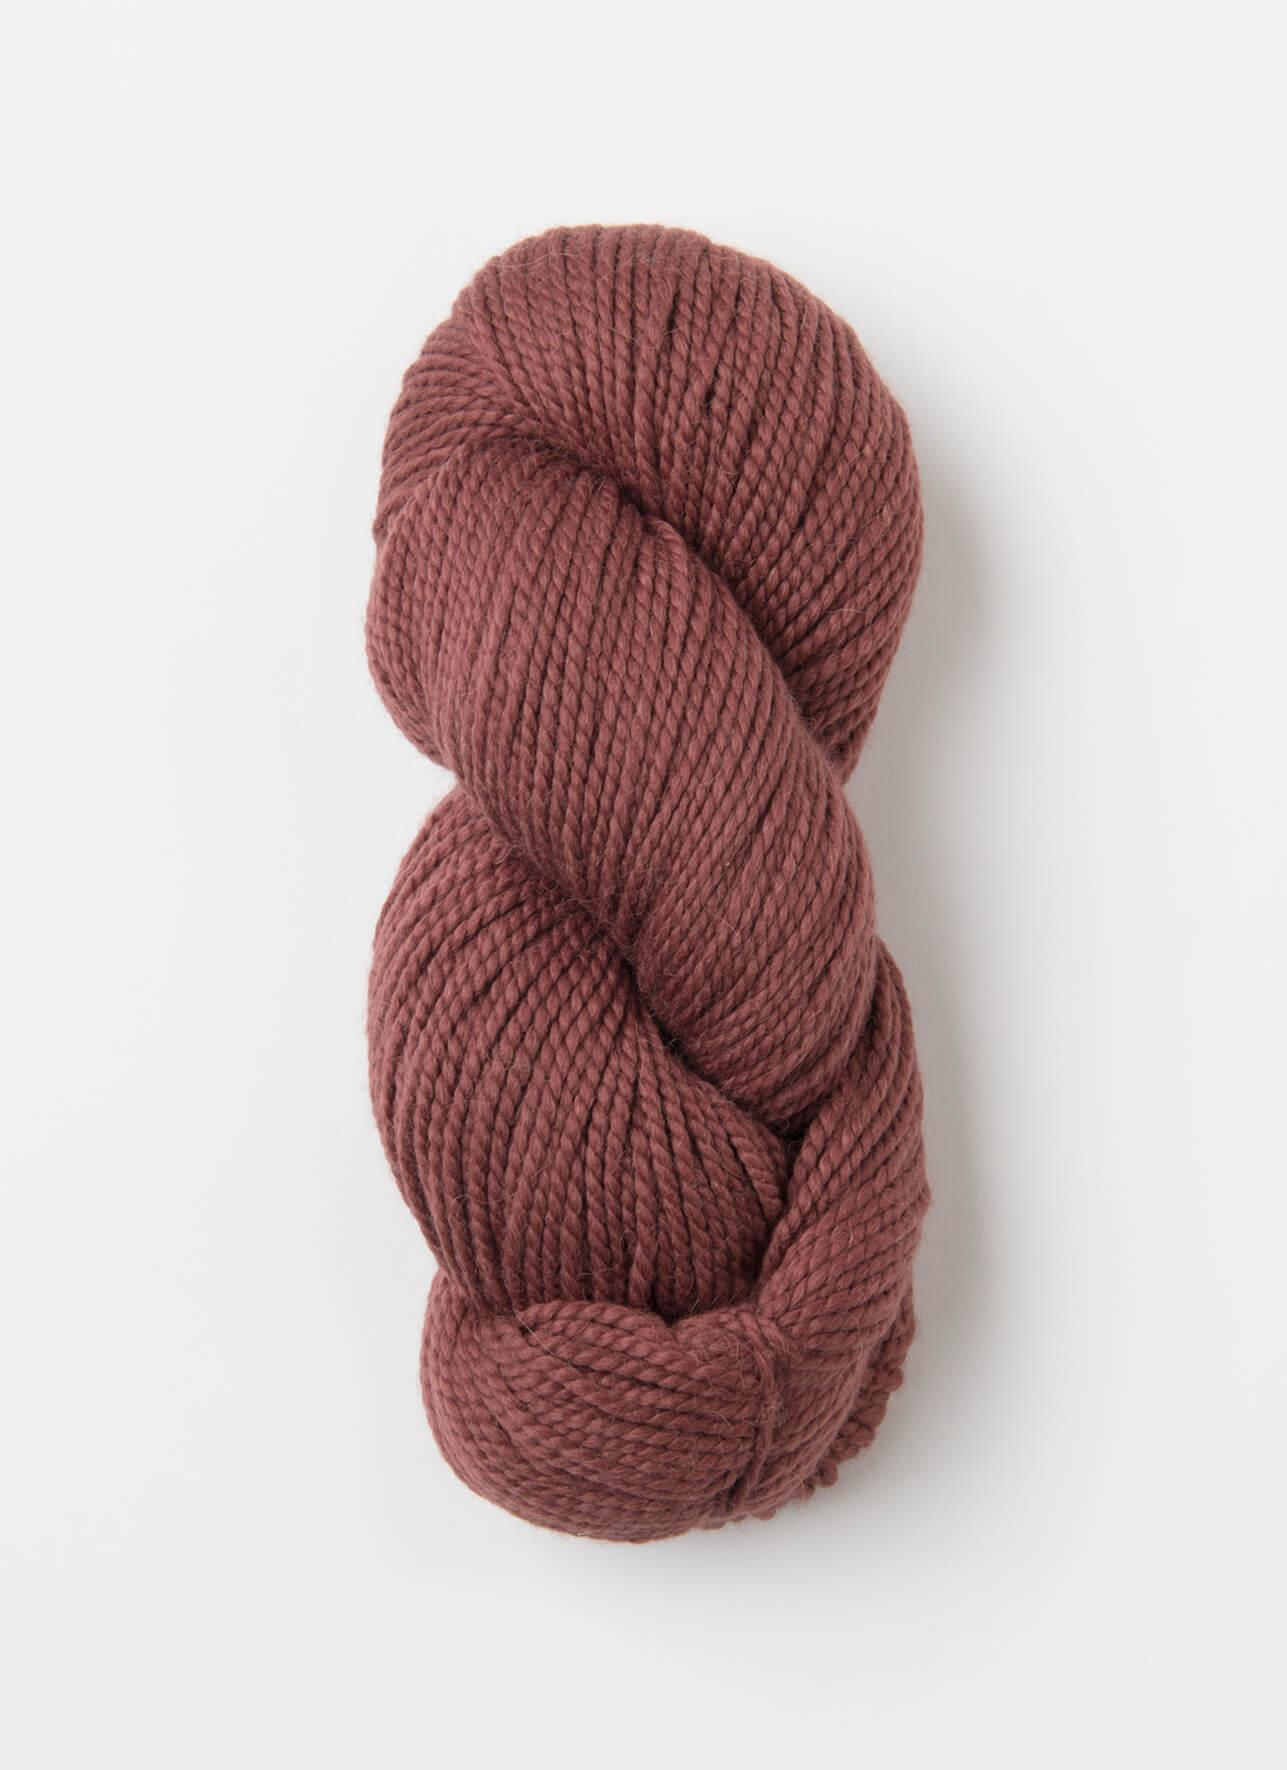 No. 3529: Mulberry Wine